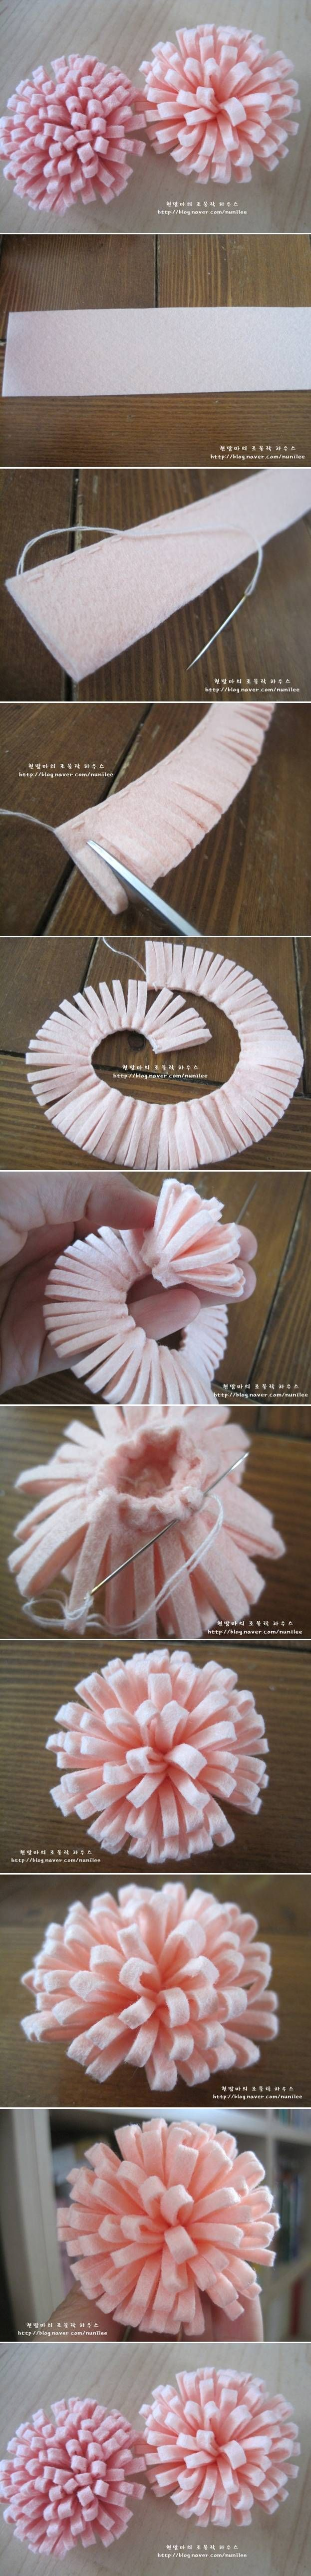 DIY Simple Easy Felt Flower